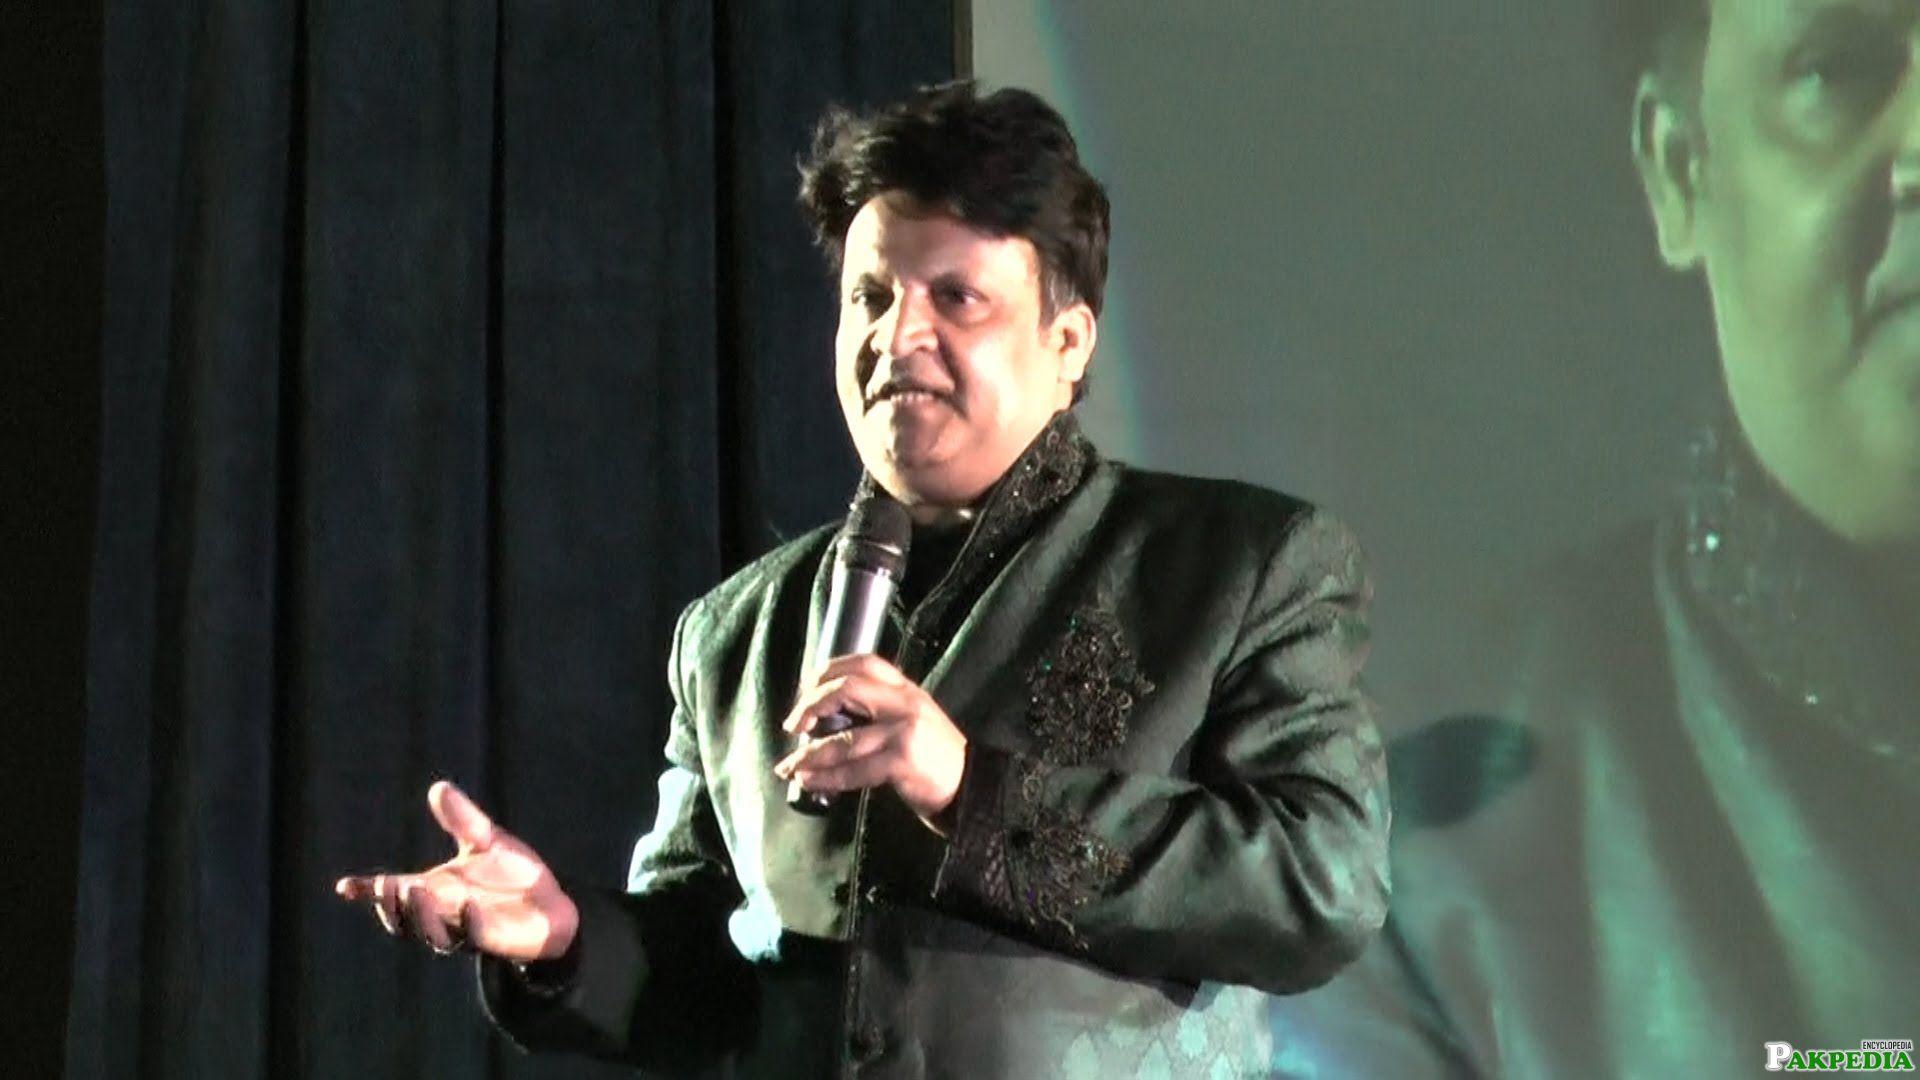 Umer Sharif at Stage